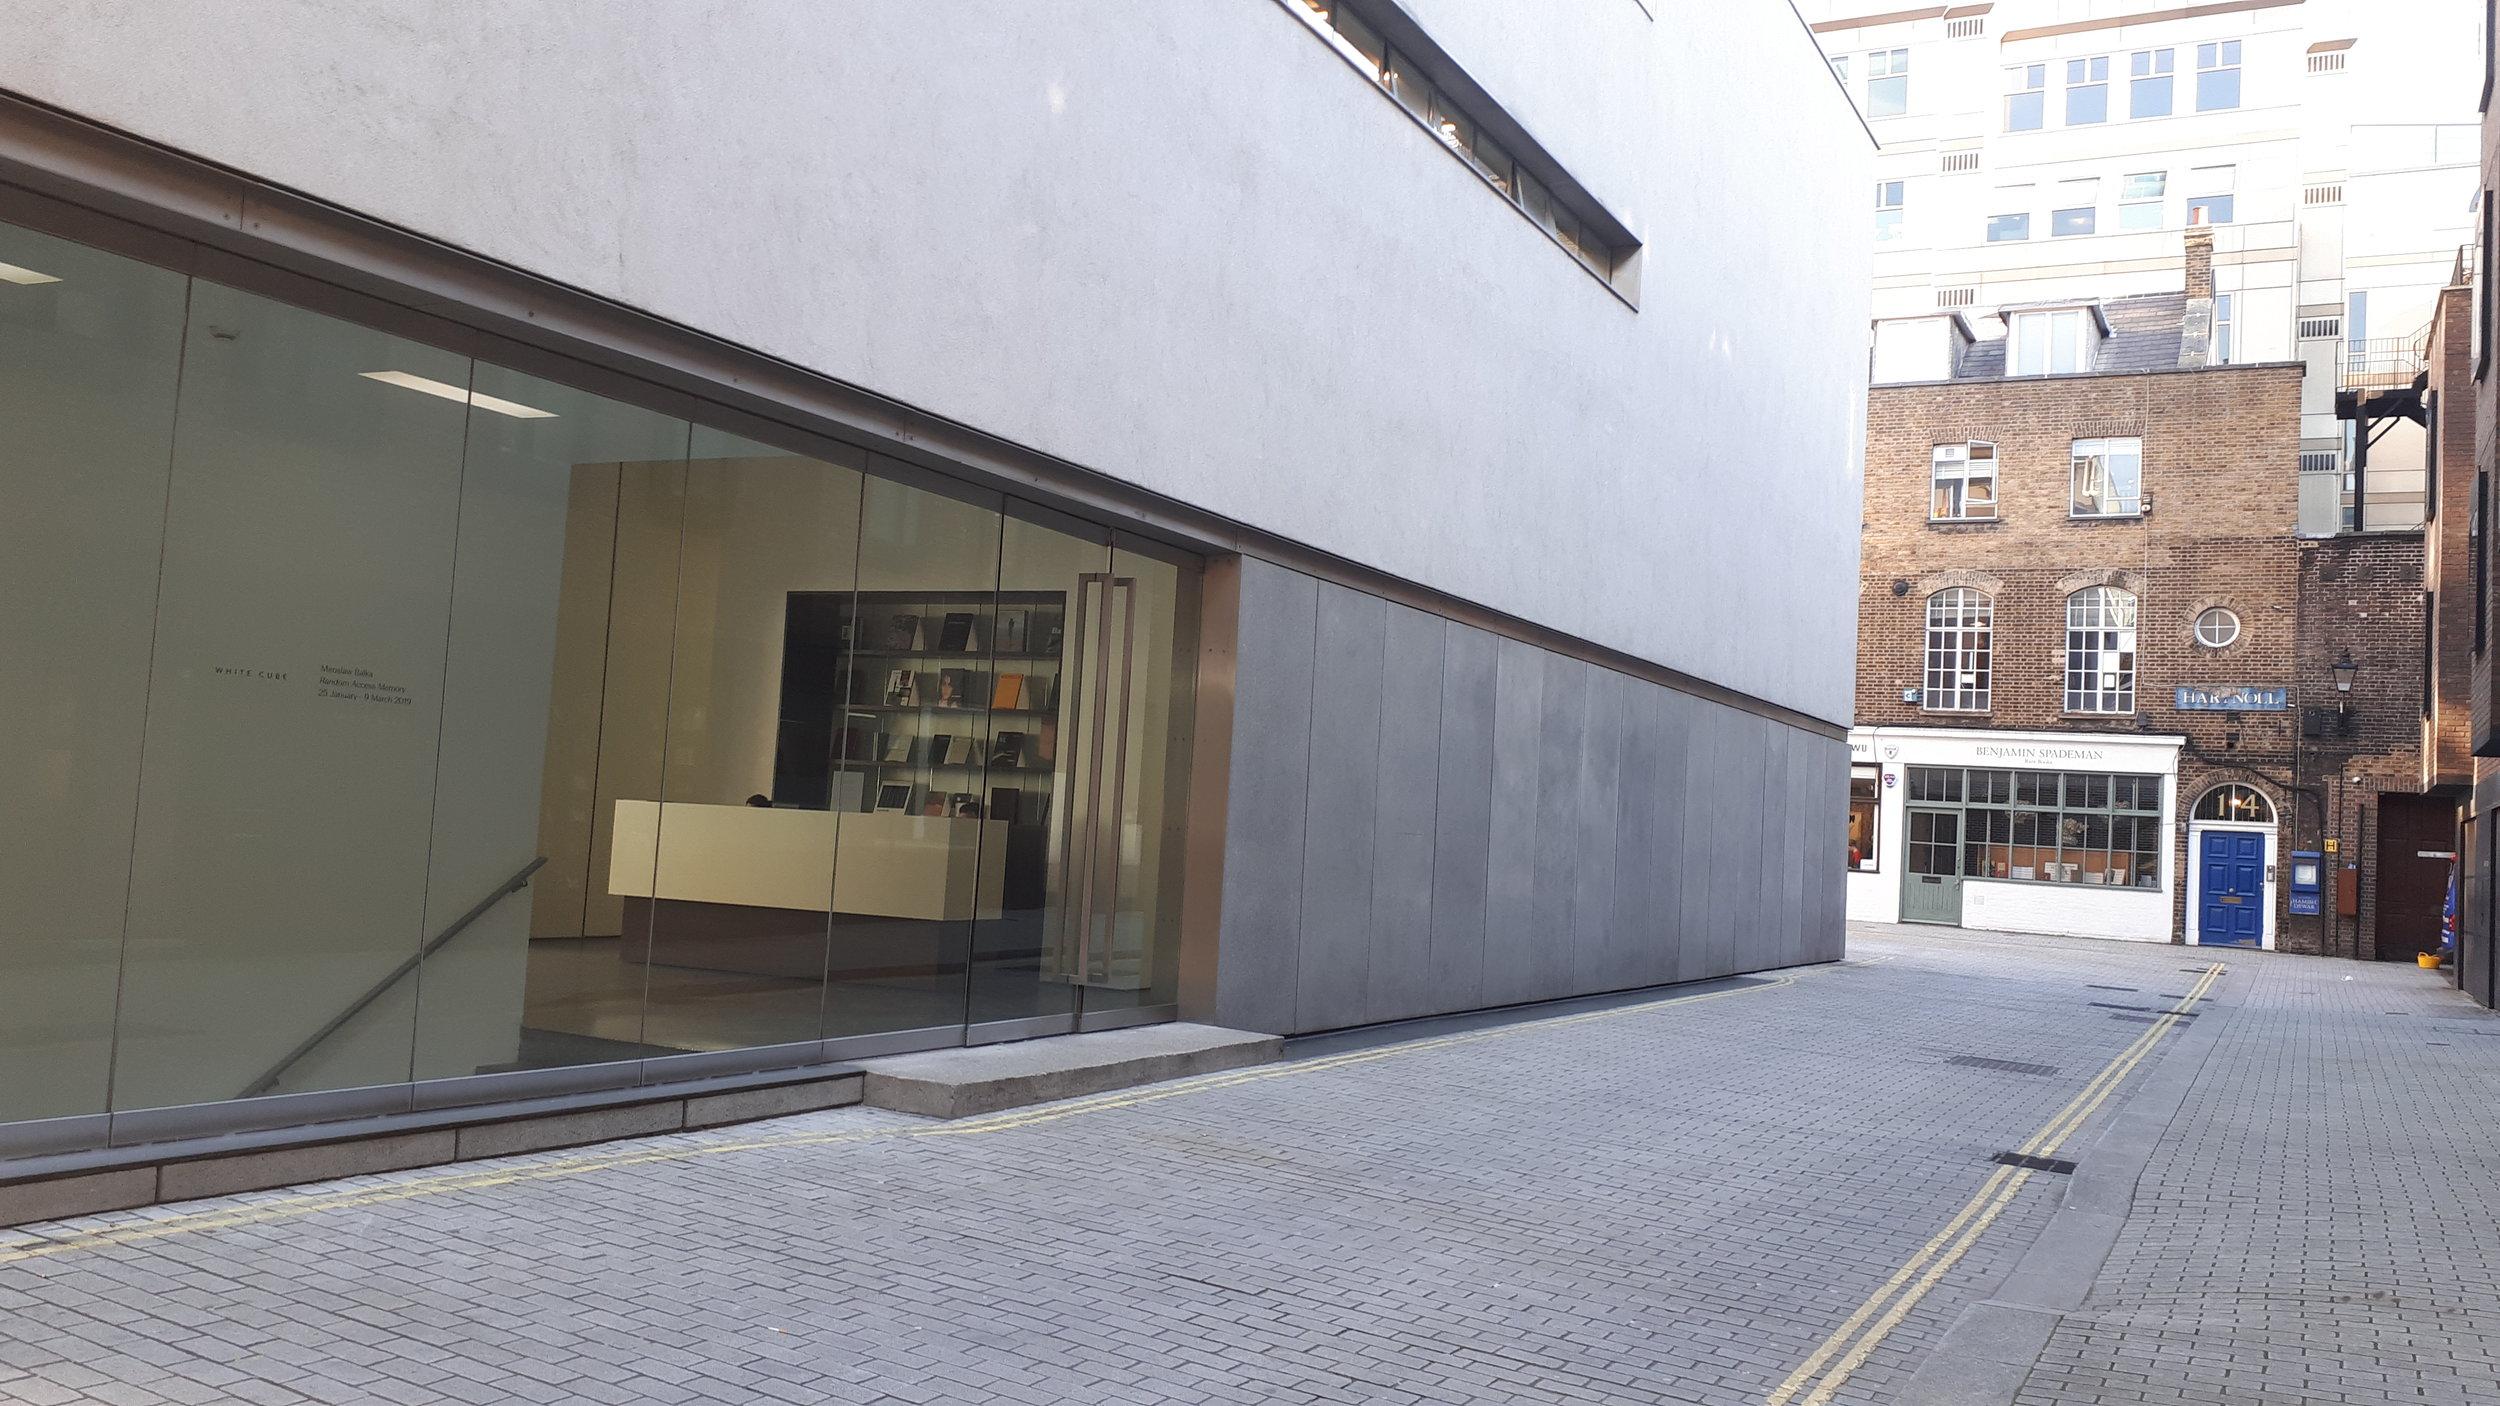 White Cube gallery, Mayfair, London